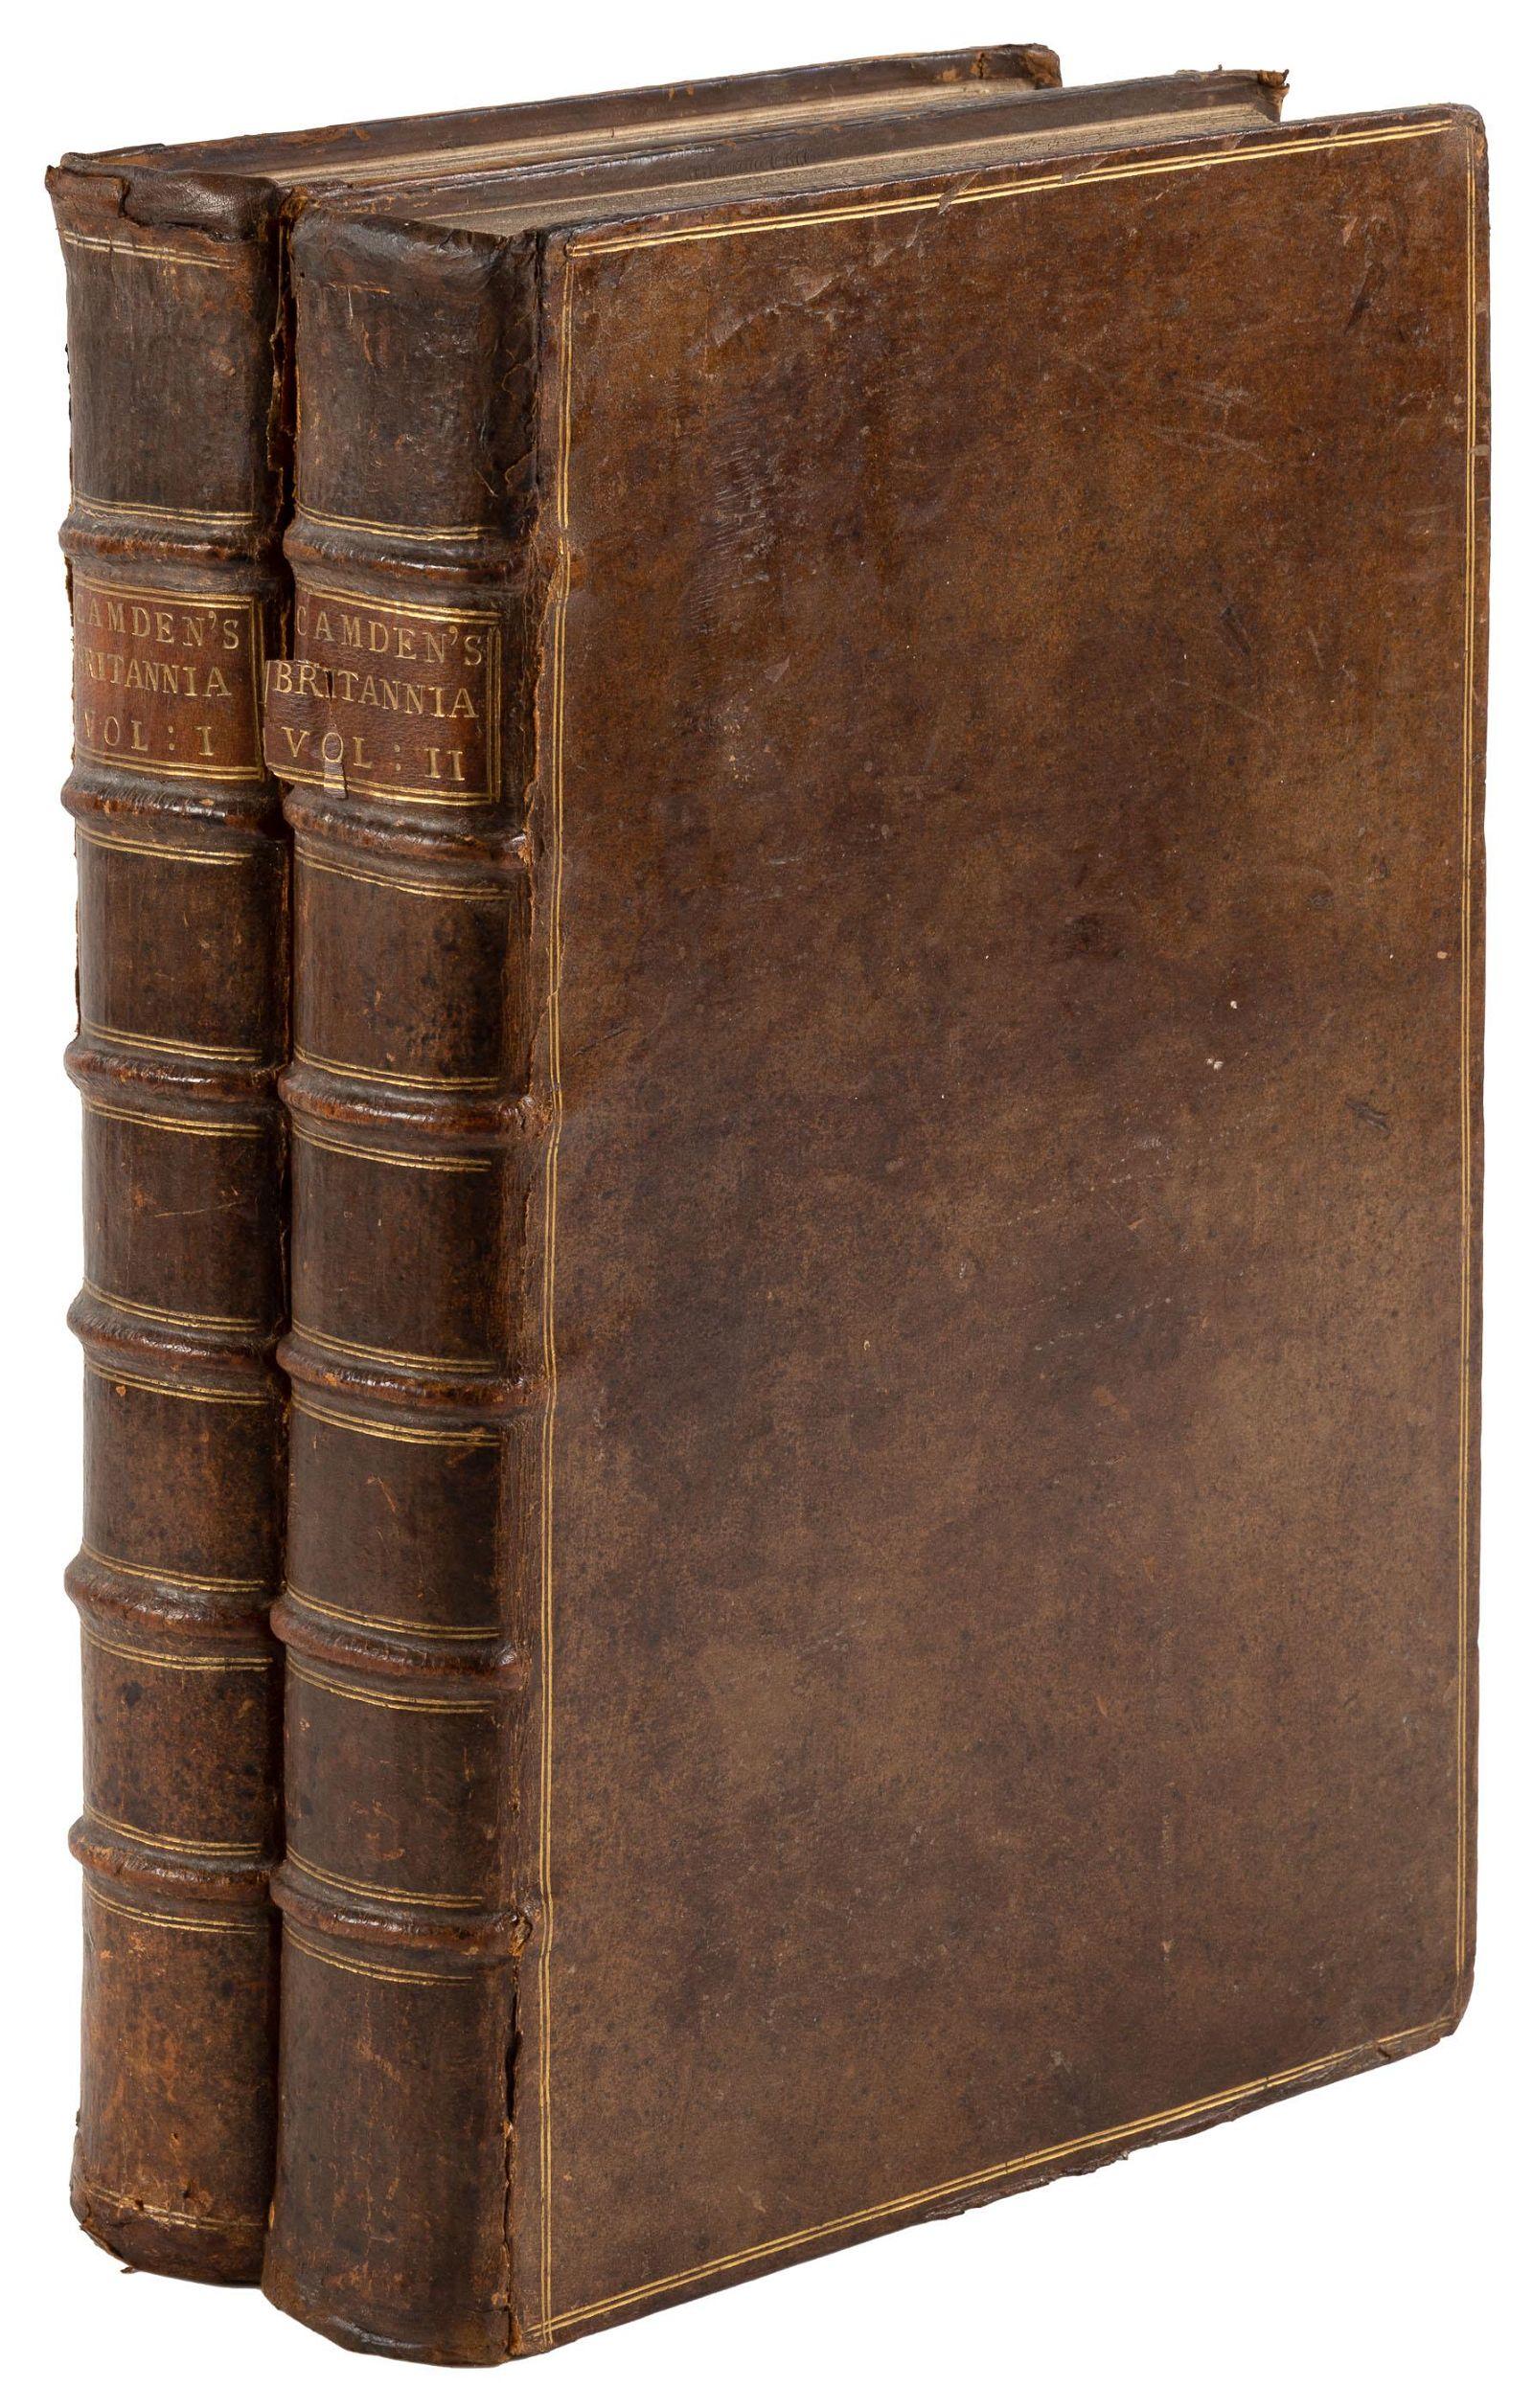 Camden's Britannia, second edition [1722]